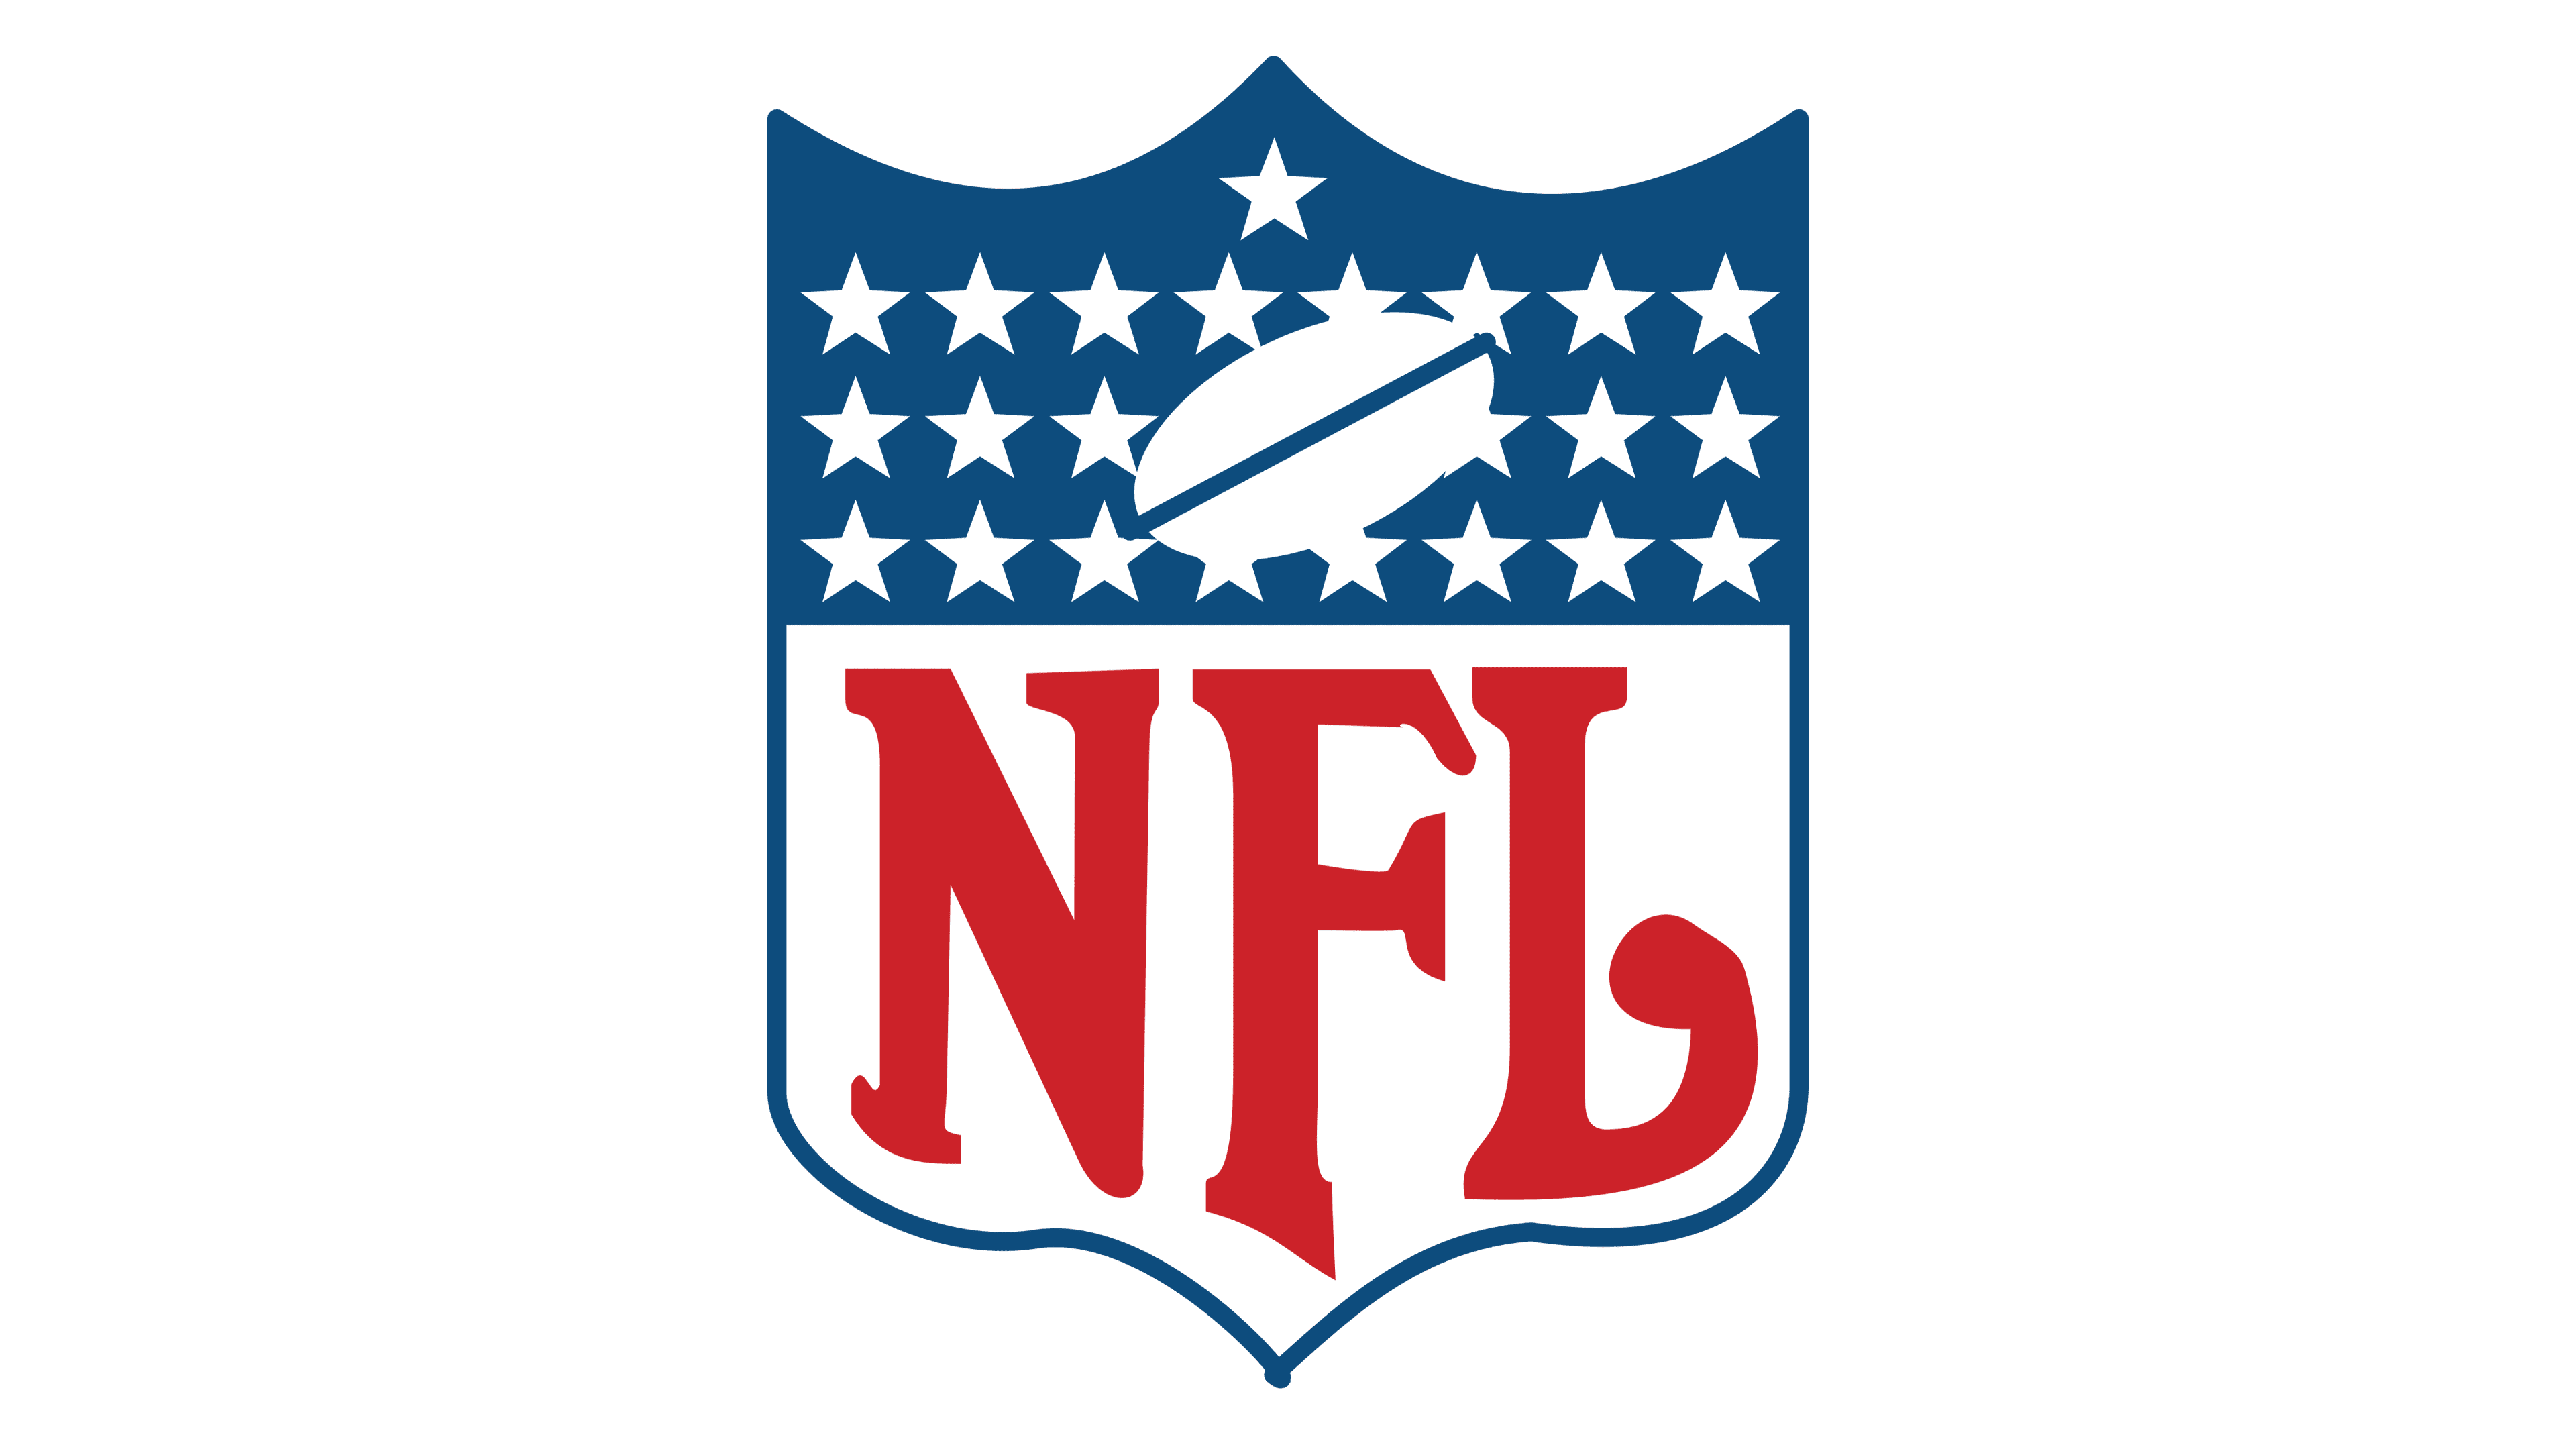 NFL logo (National Football League) Logo